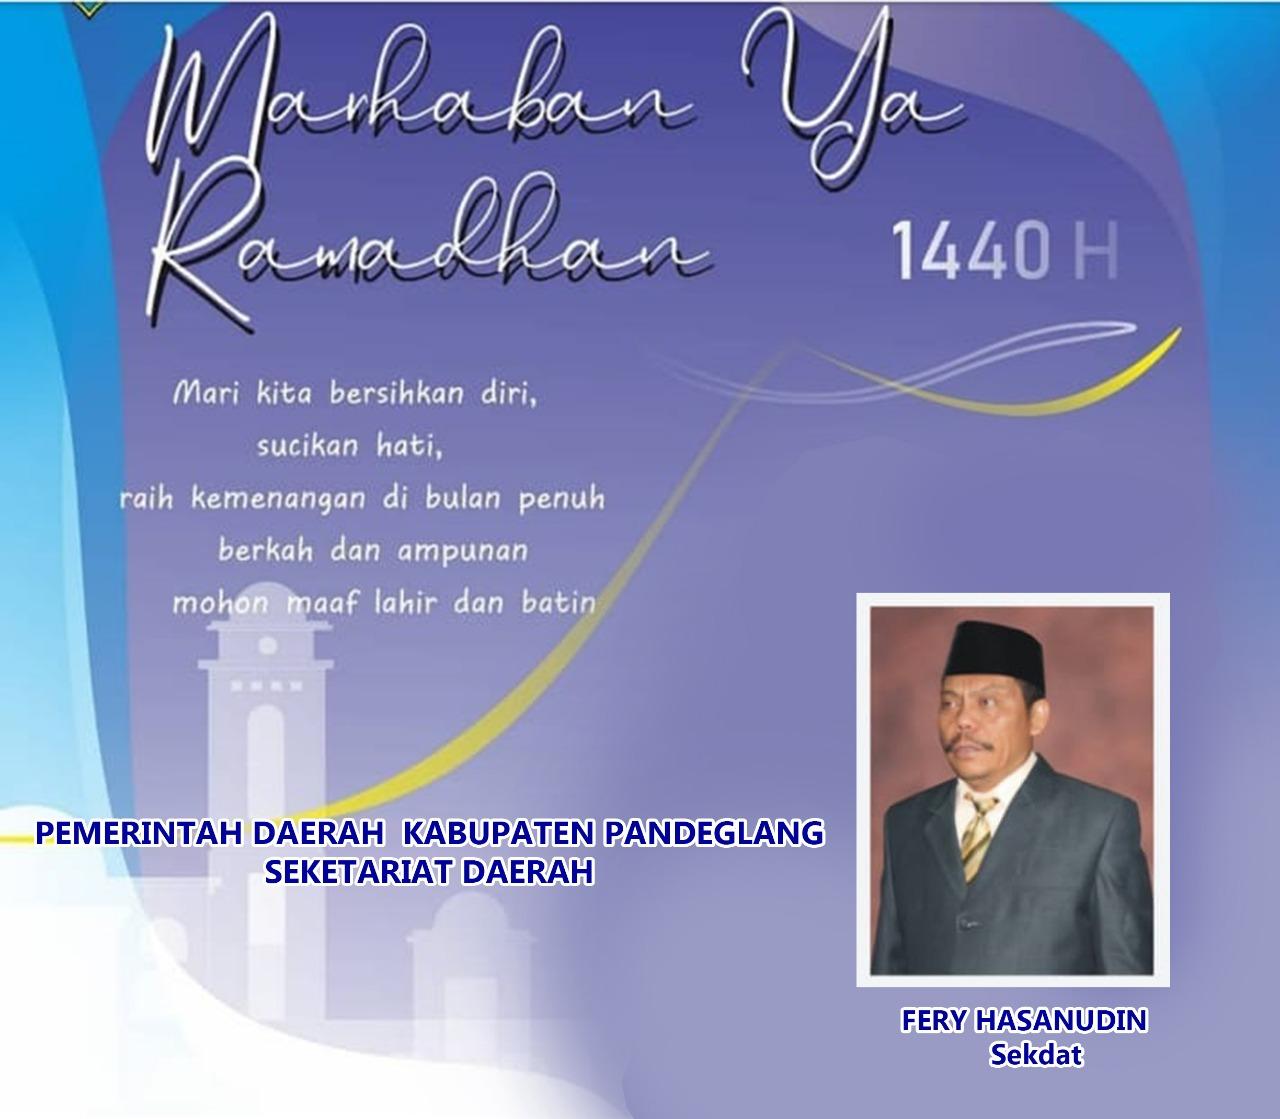 Fery Hasanudin